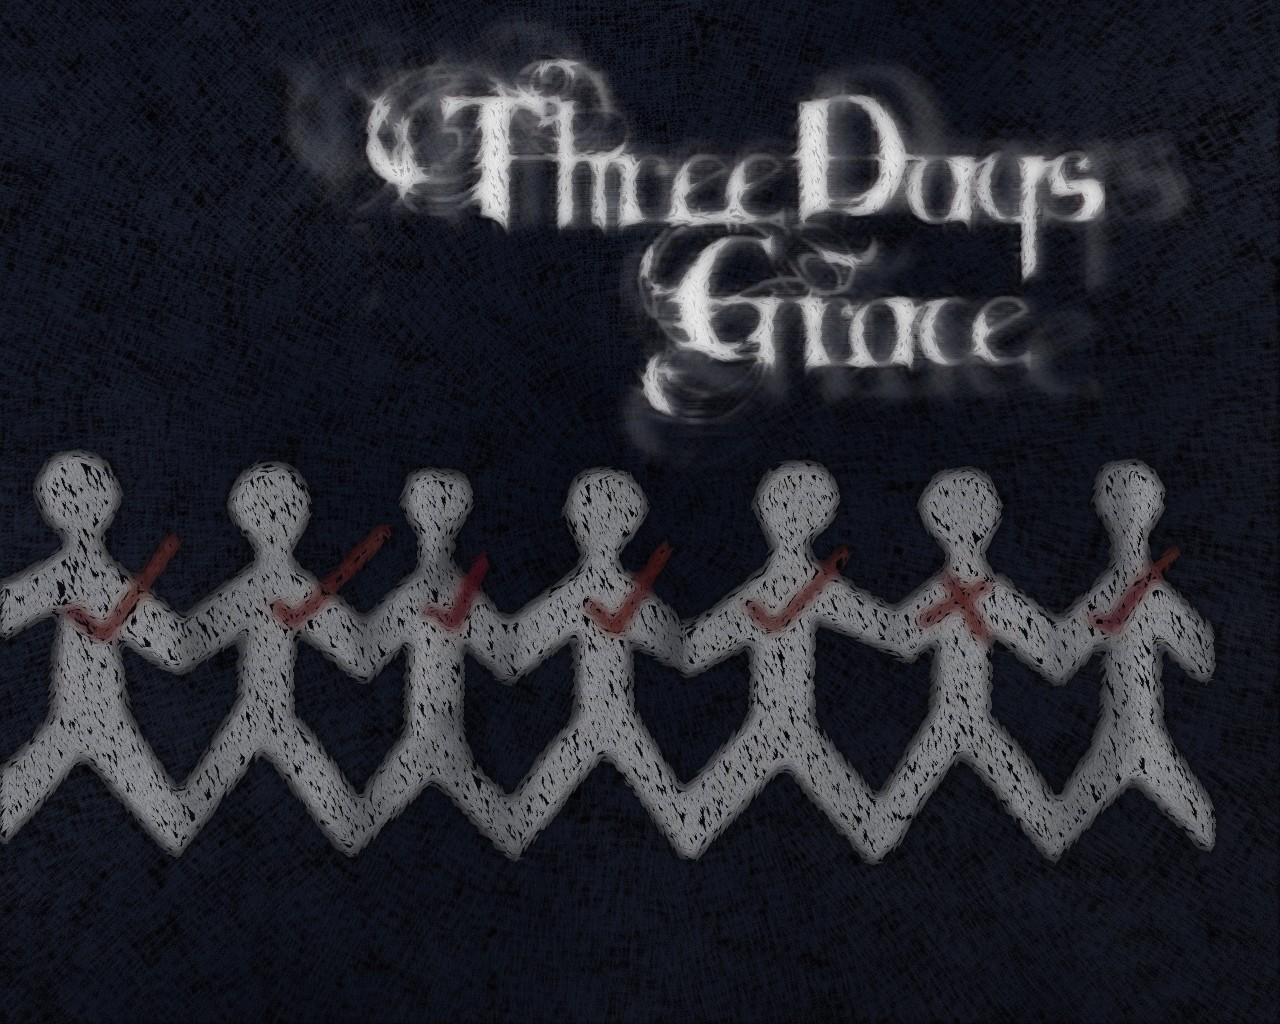 Best 57 Three Days Grace Wallpaper on HipWallpaper Three Tailed 1280x1024